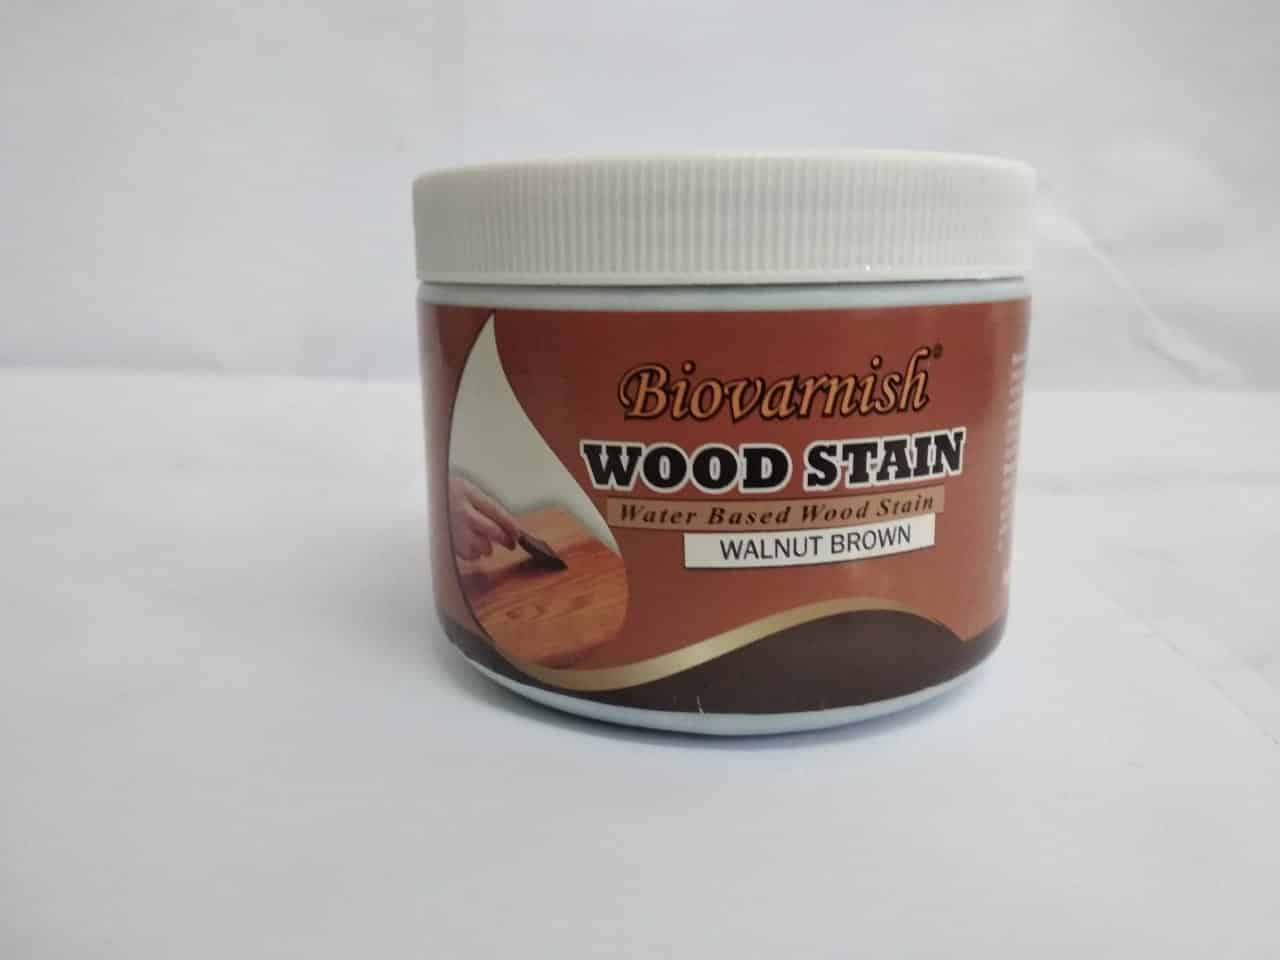 Wood-Stain-dari-Biovarnish